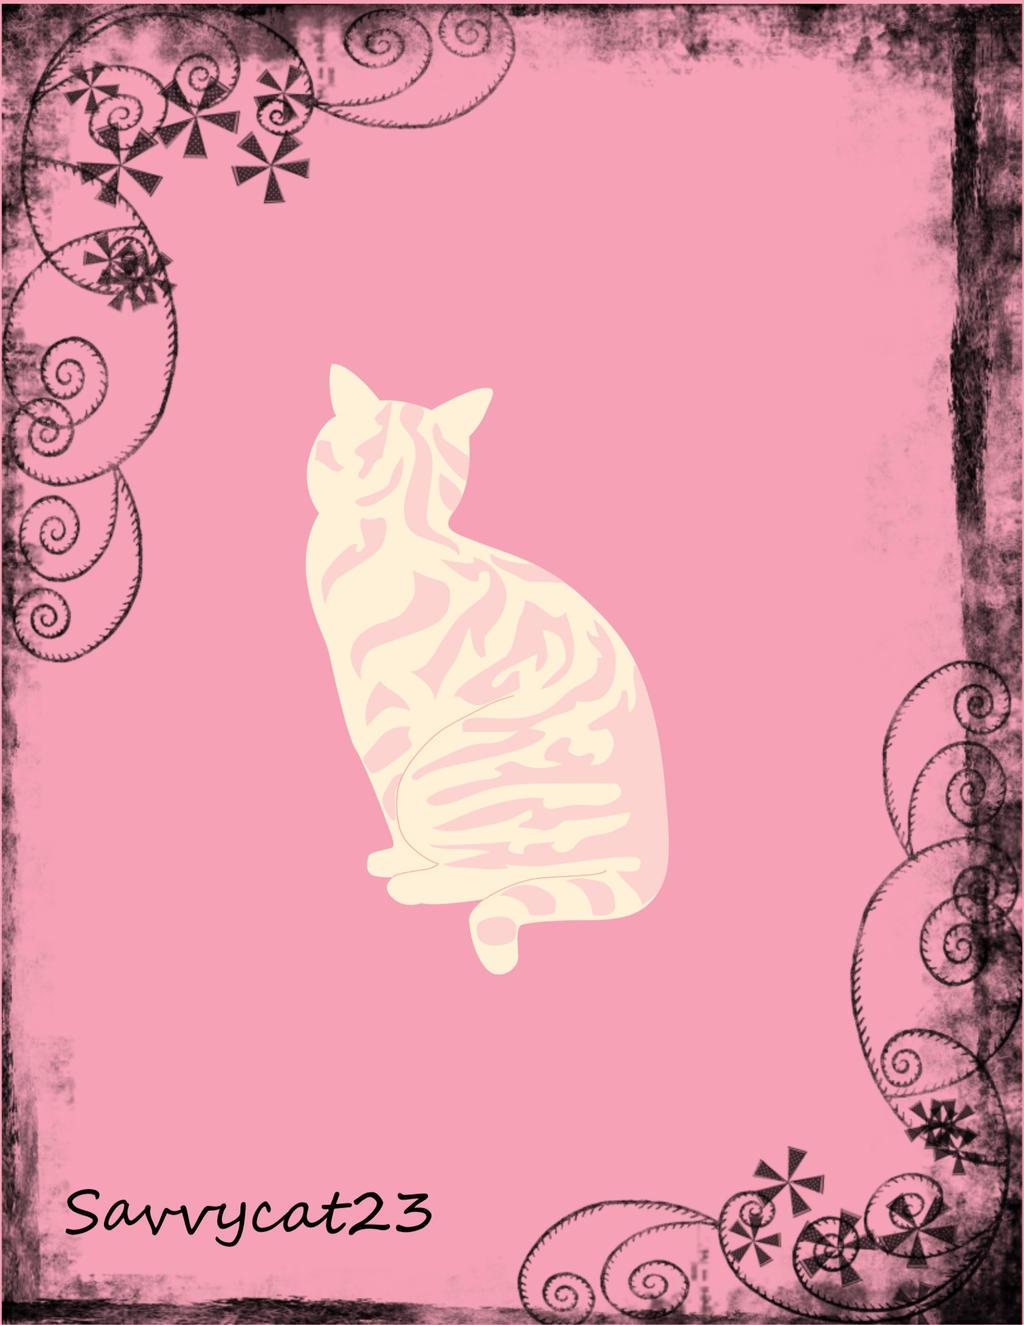 Savvycat23's Profile Picture